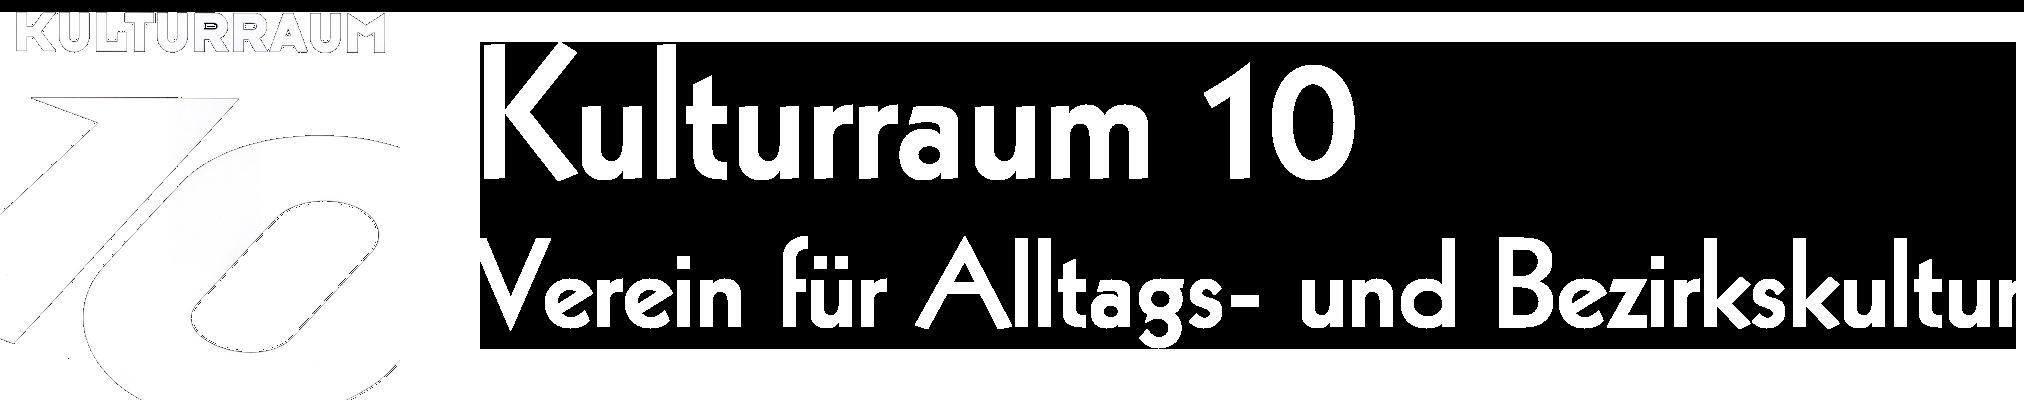 Kulturraum 10